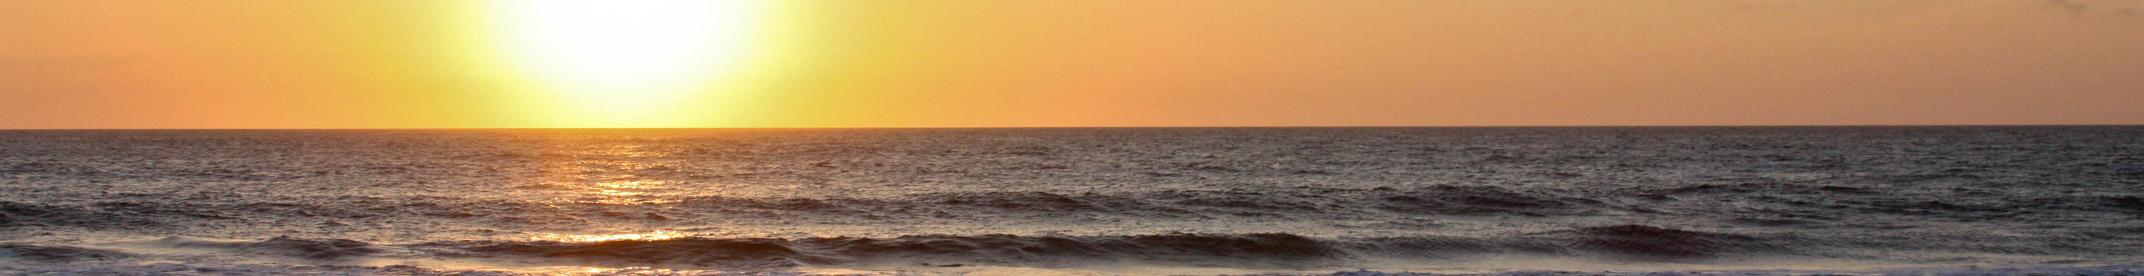 A.C. Beachfront-Banner